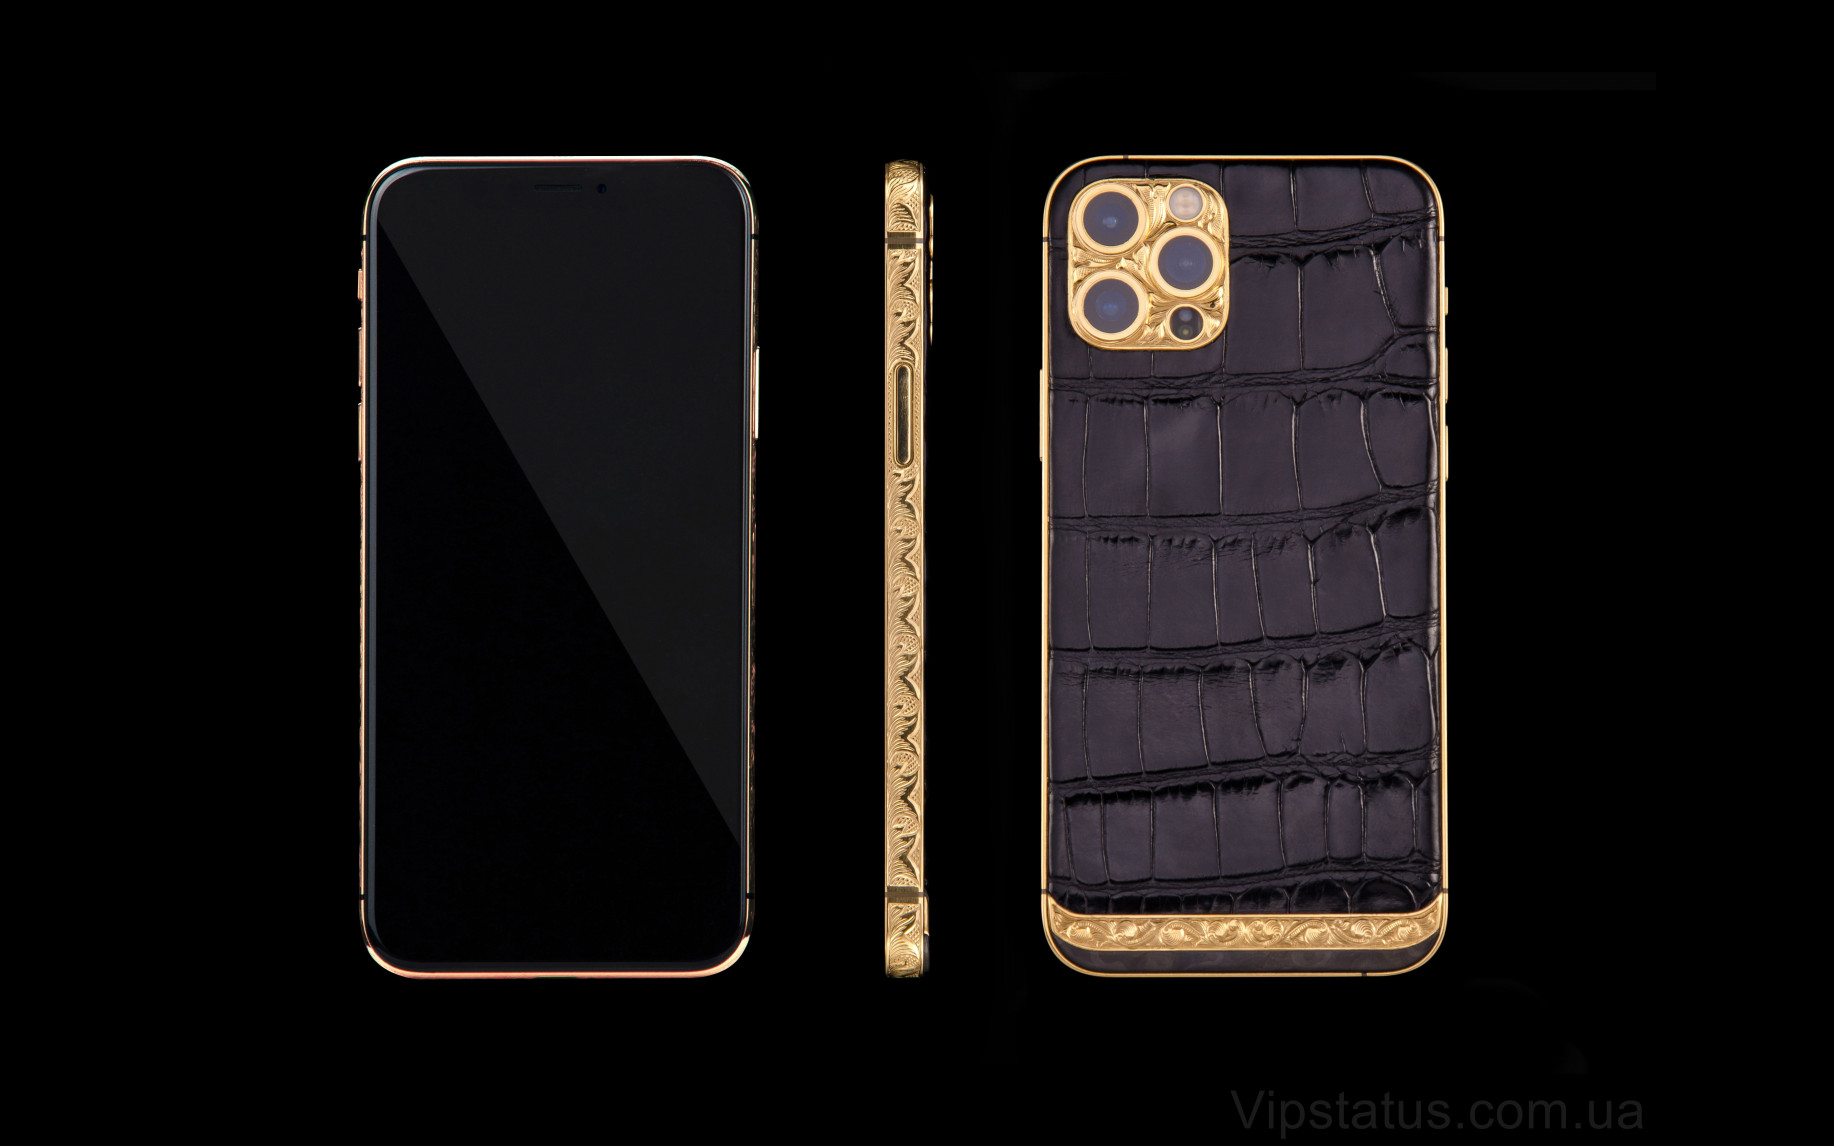 Elite Gold Edition IPHONE 12 PRO MAX 512 GB Gold Edition IPHONE 12 PRO MAX 512 GB image 8